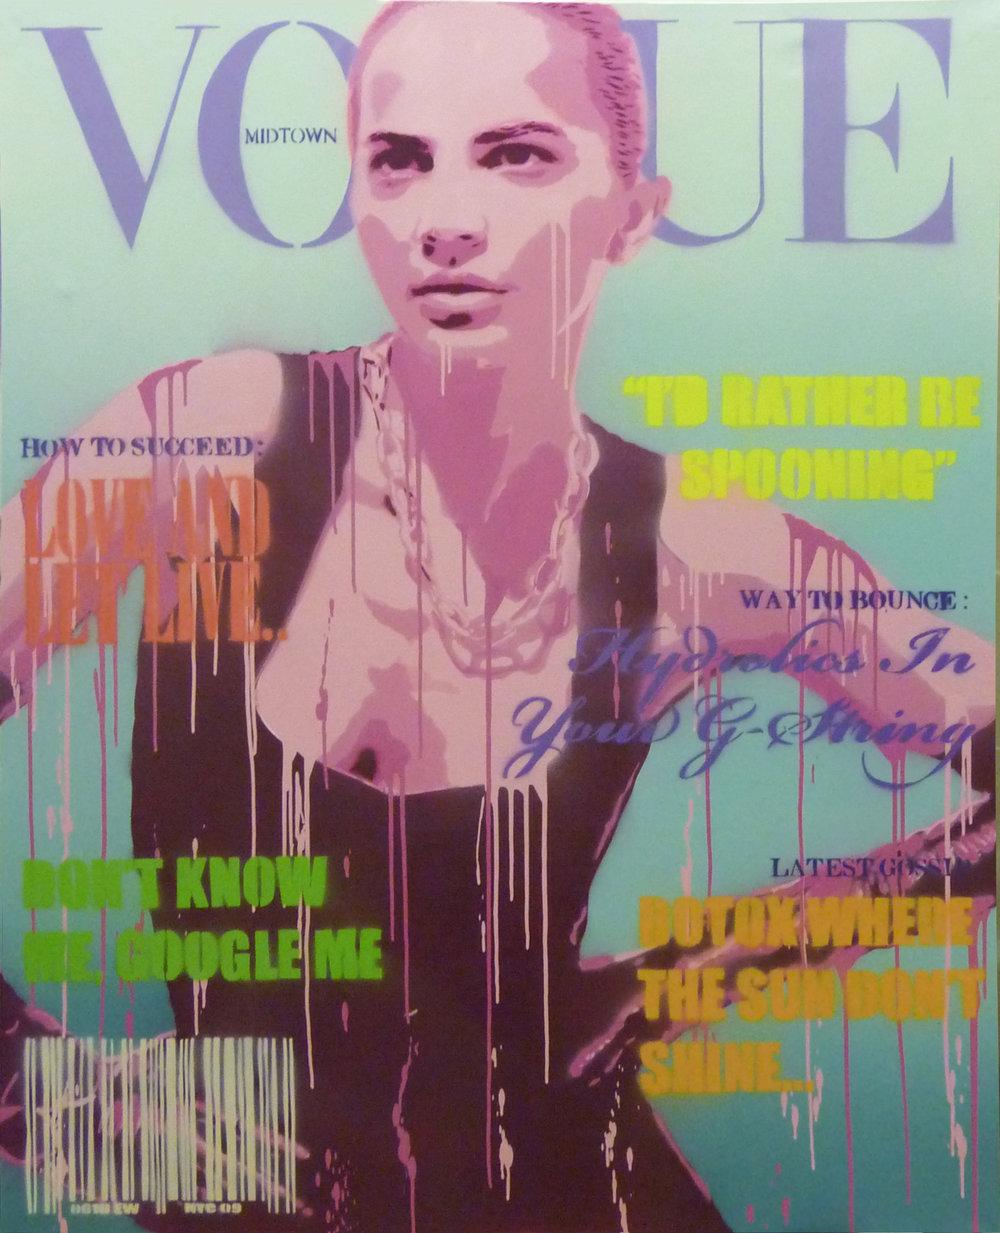 Midtown Vogue - Wim.jpg